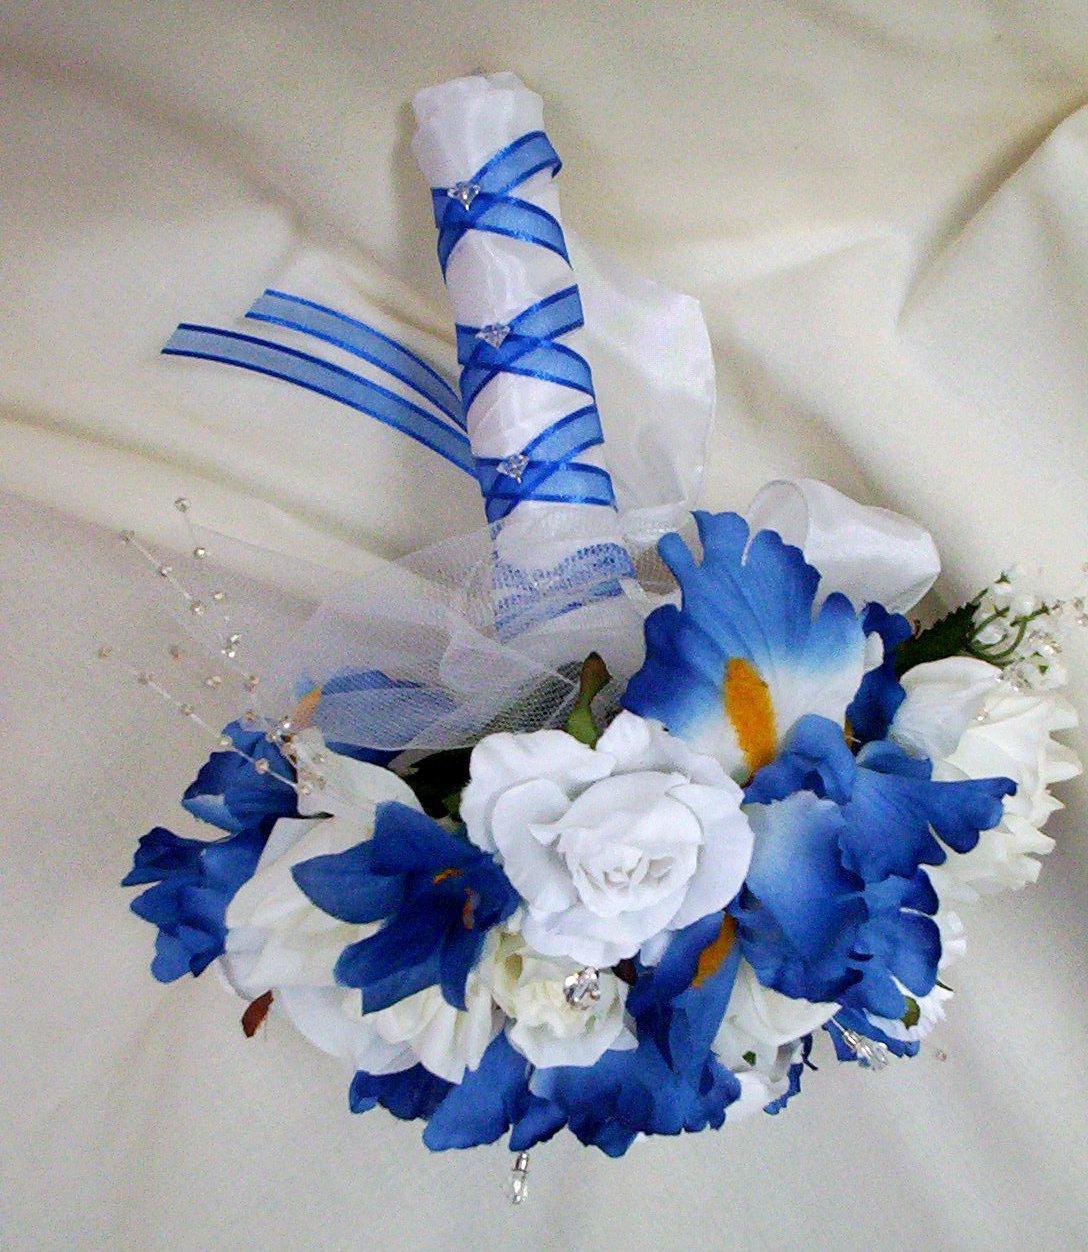 Yanisells blog and blue wedding flowers and blue wedding flowers izmirmasajfo